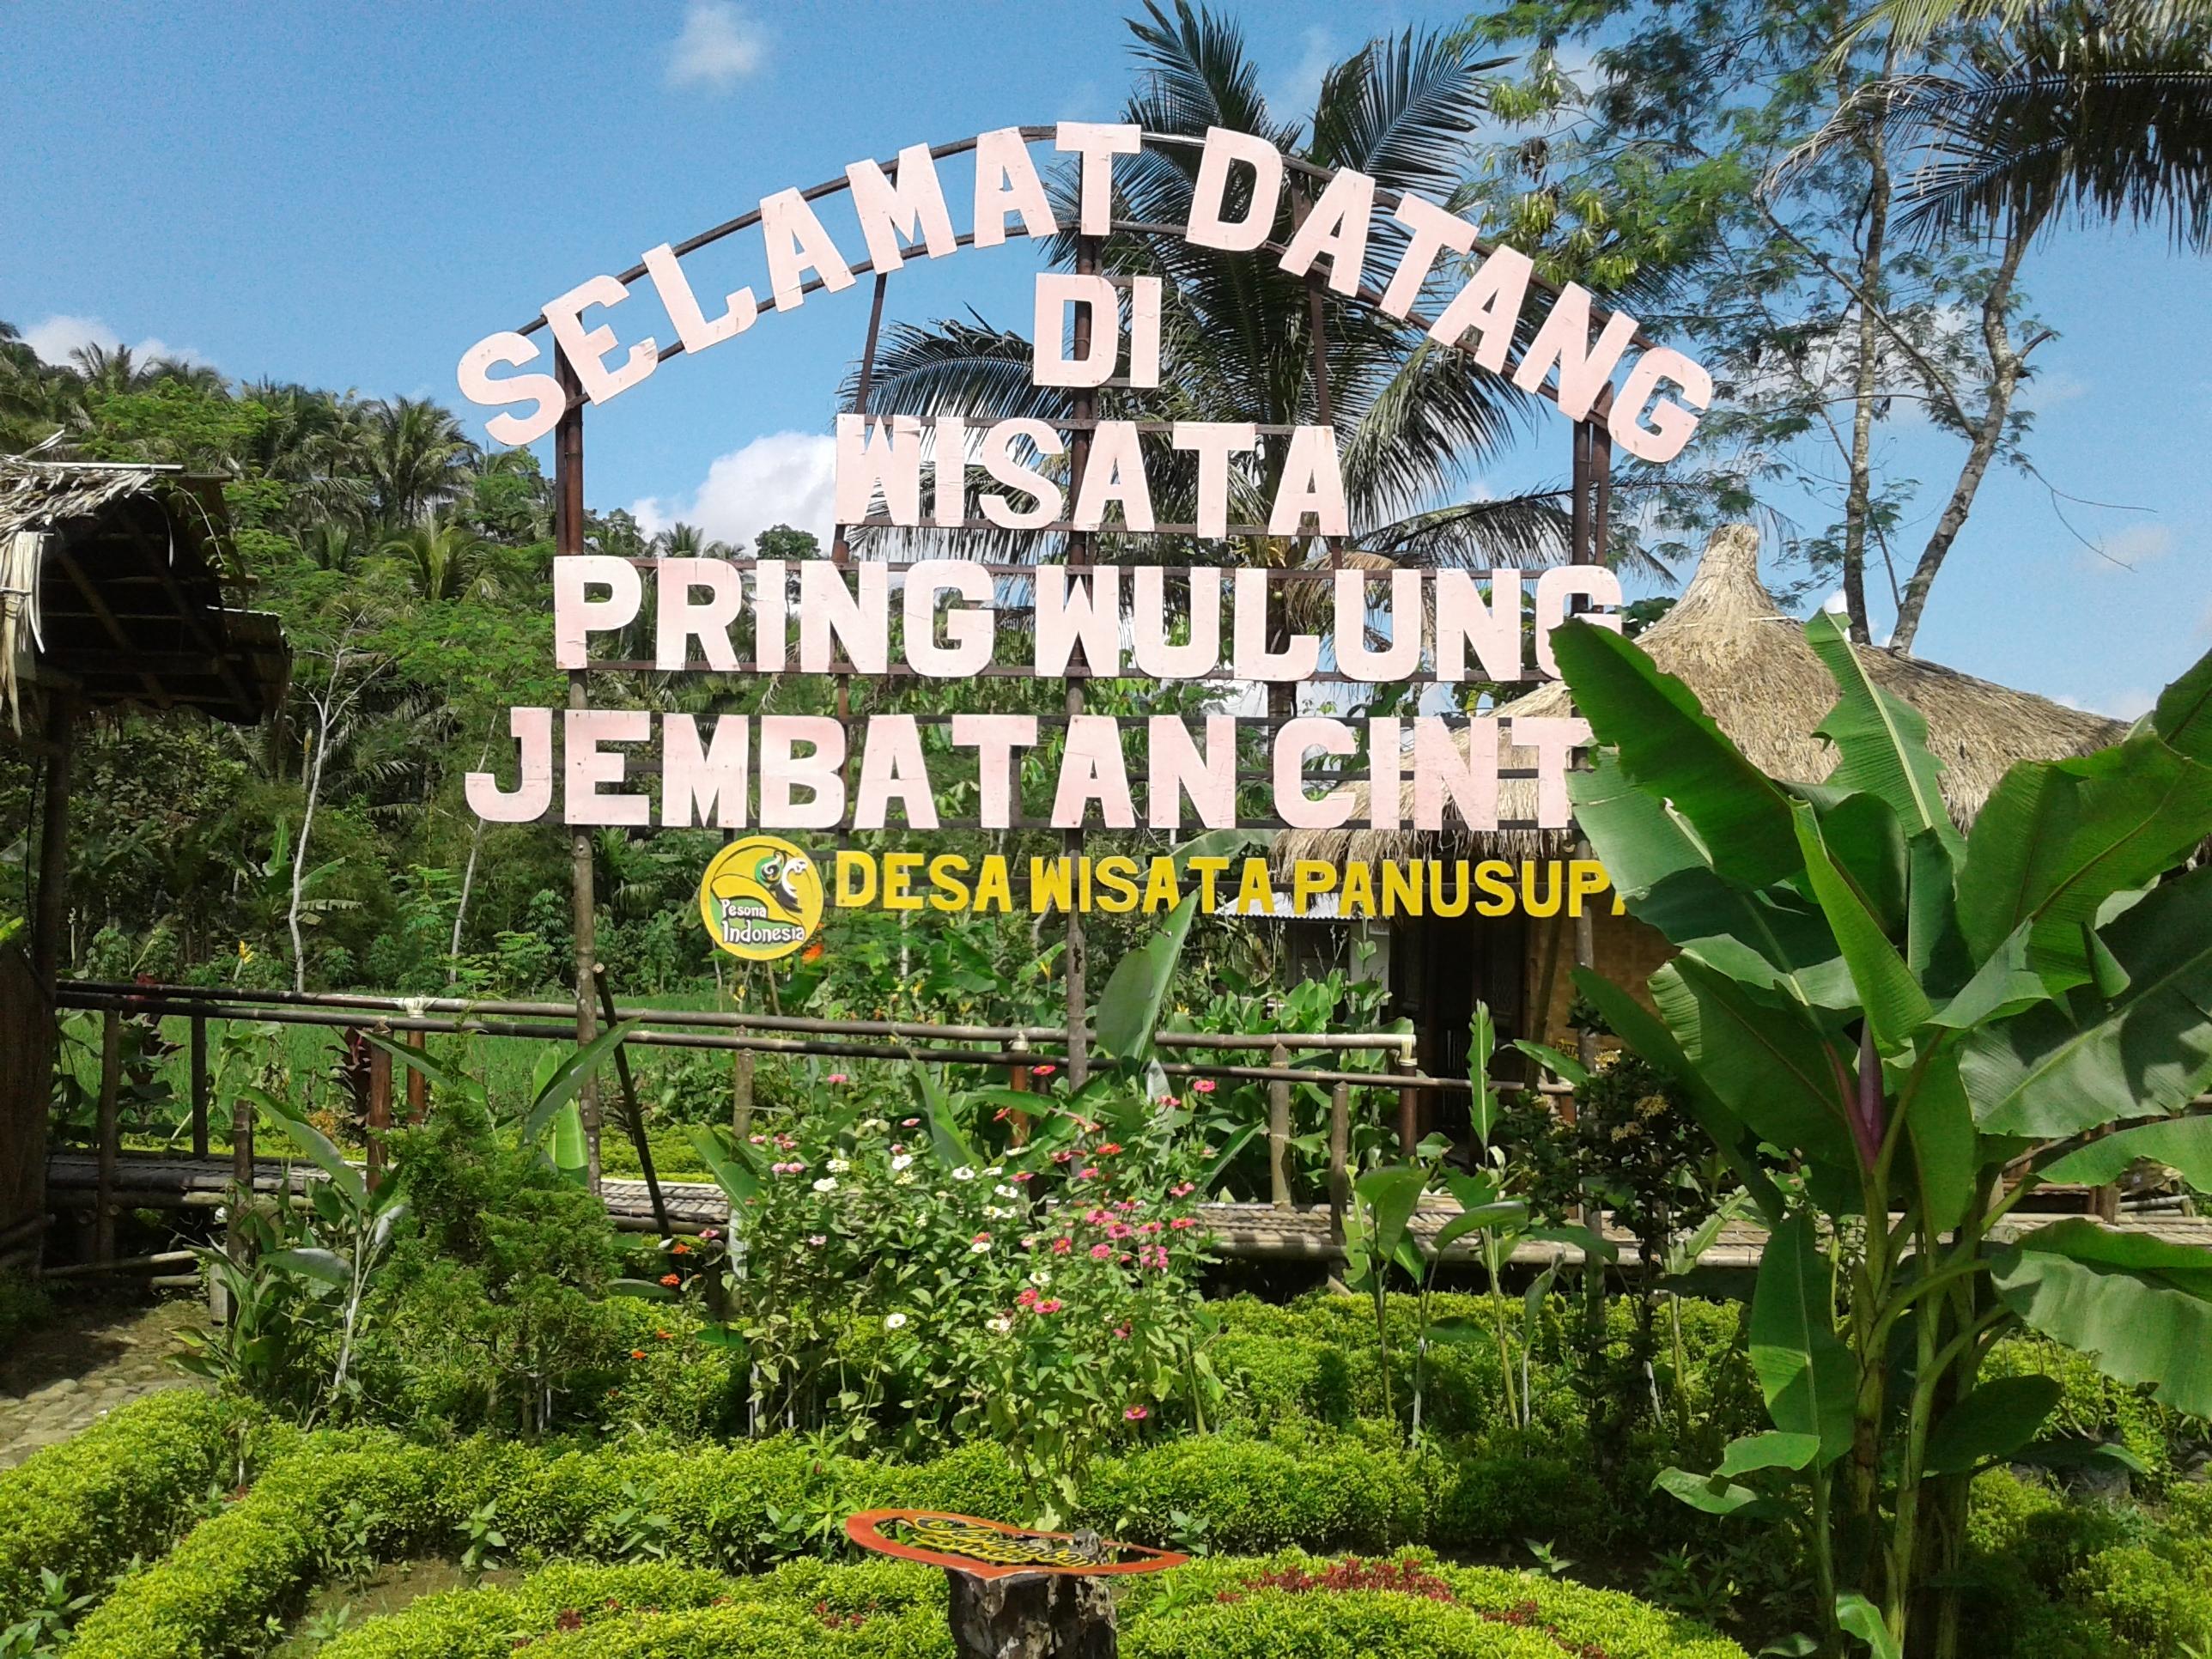 Jembatan Cinta Pring Wulung Destinasi Epic Purbalingga Selamat Datang Kab